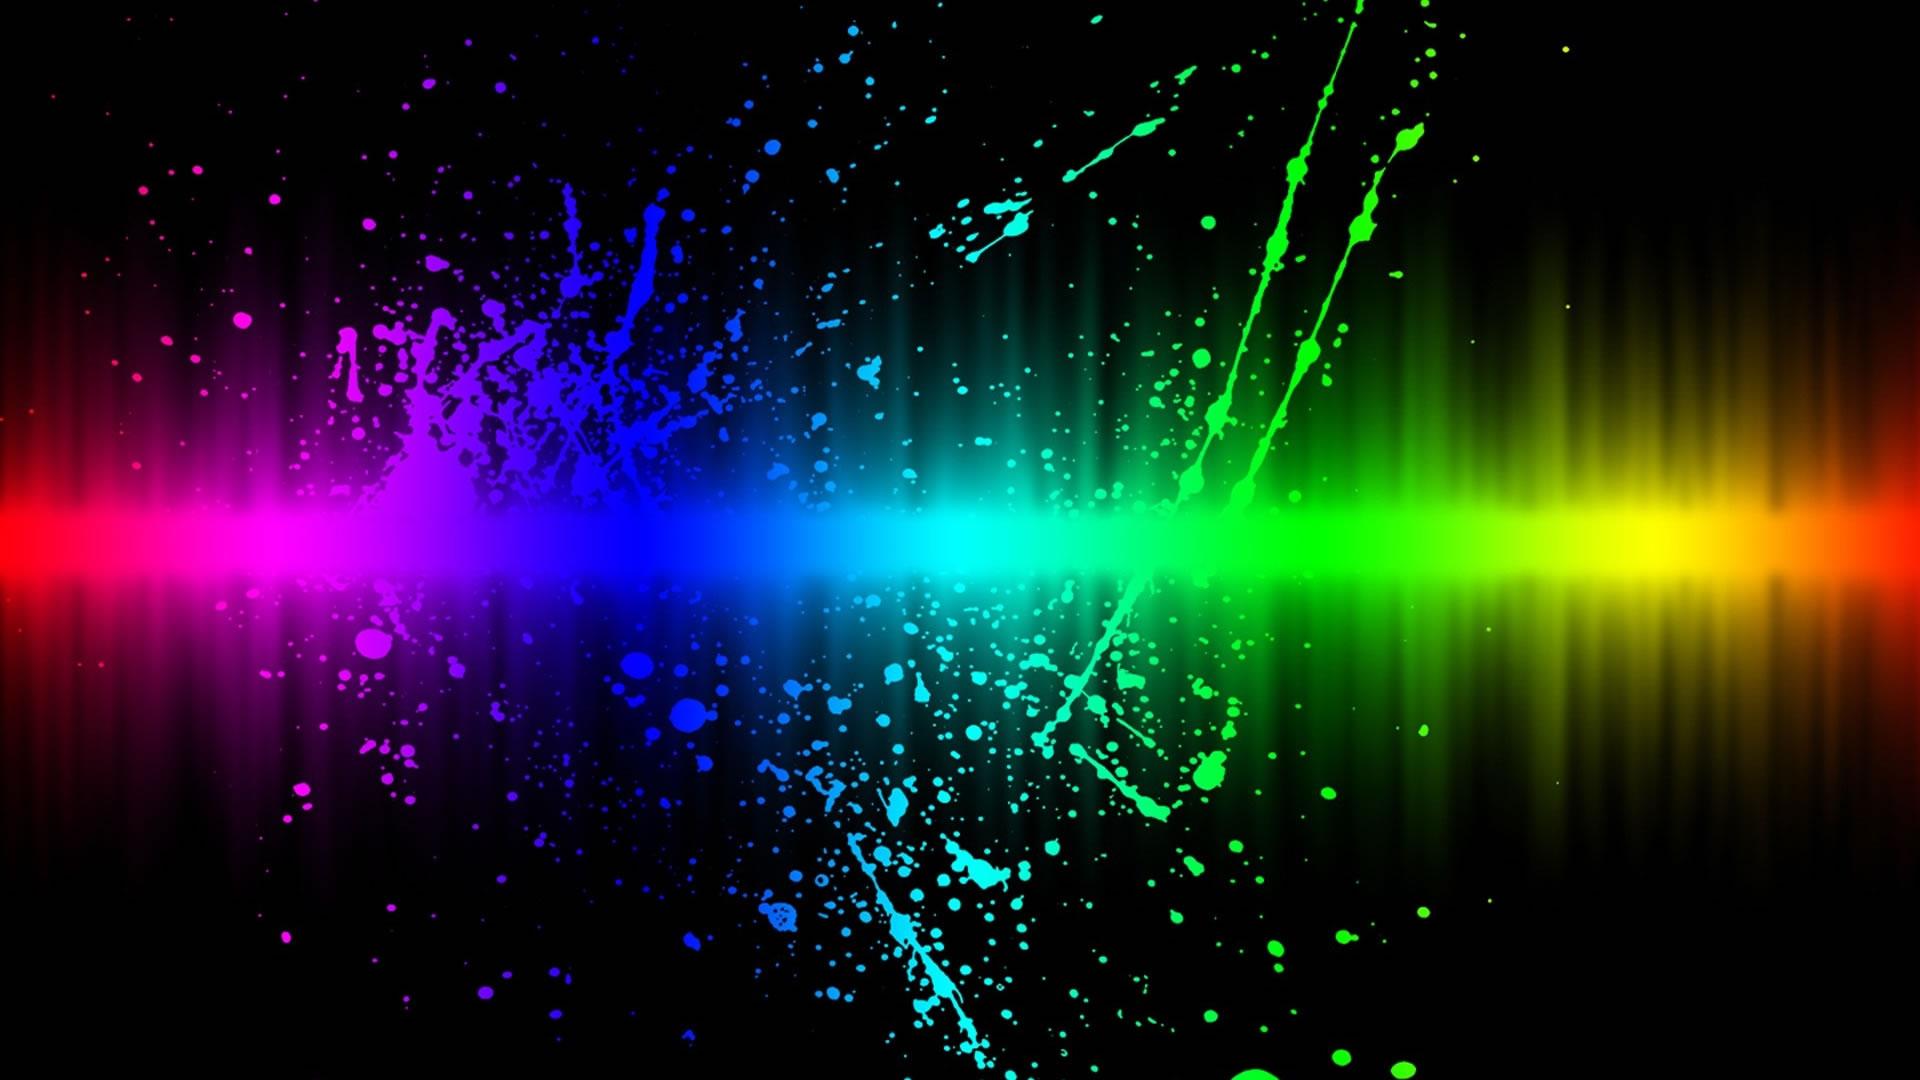 Splashing-of-Colours-HD-Wallpaper.jpg